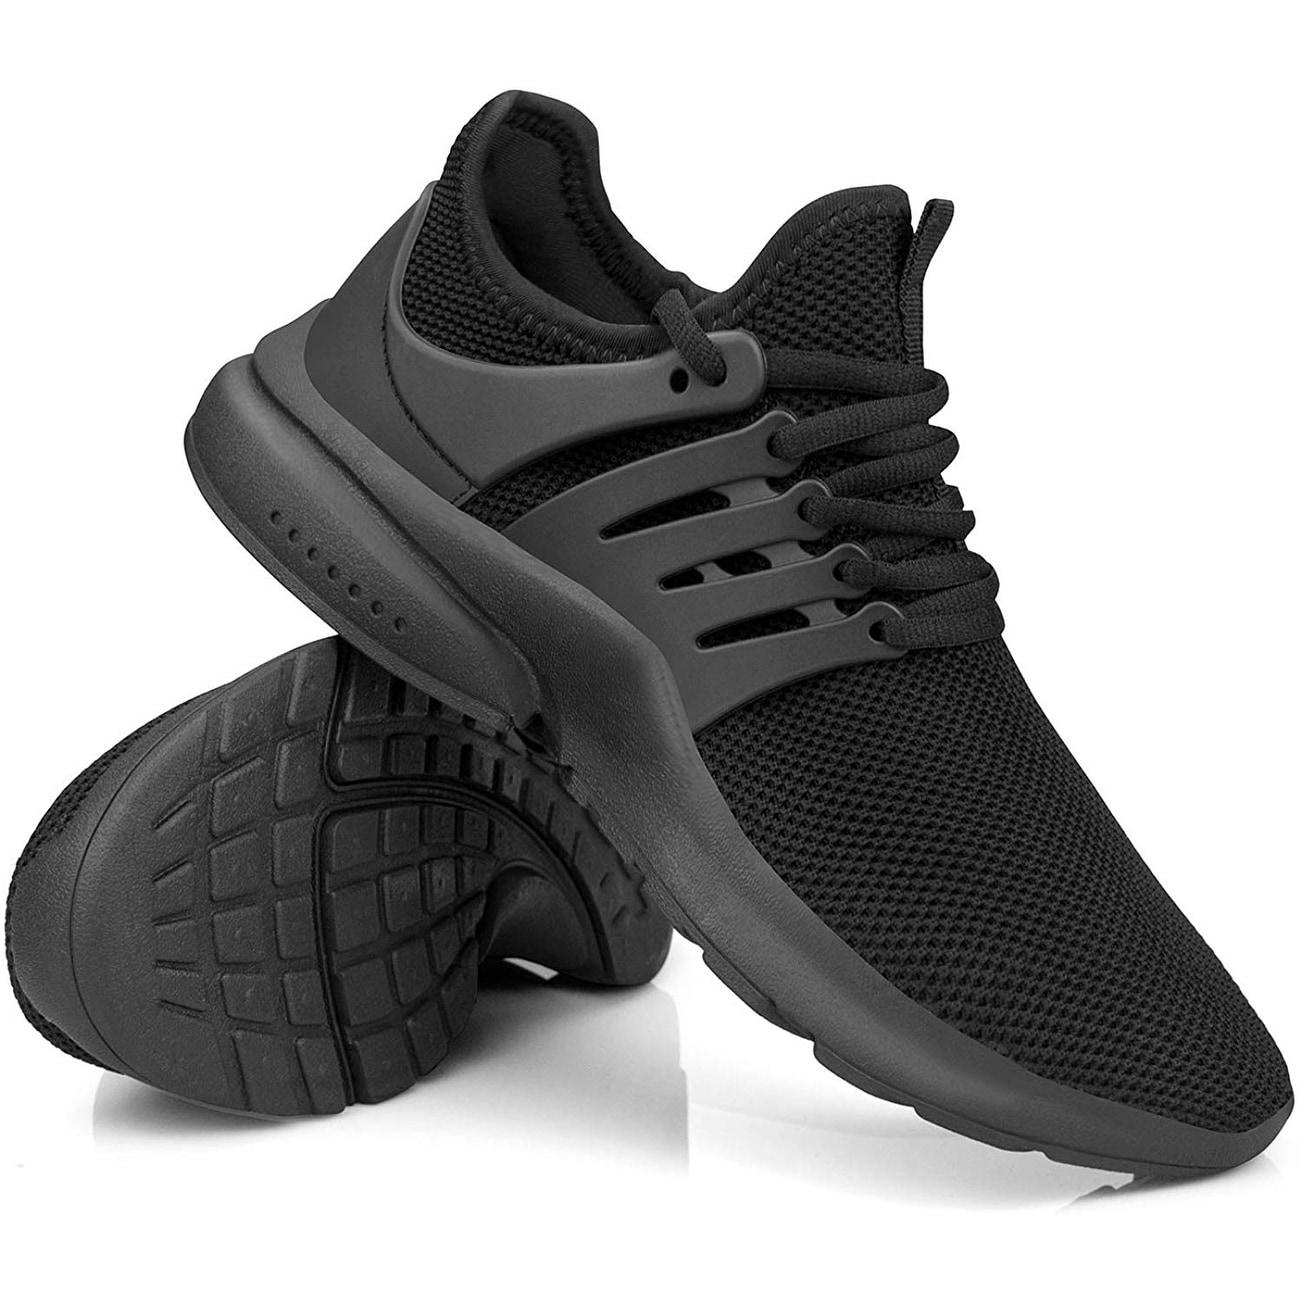 Troadlop Womens Sneakers Lightweight Breathable Slip On Shoes